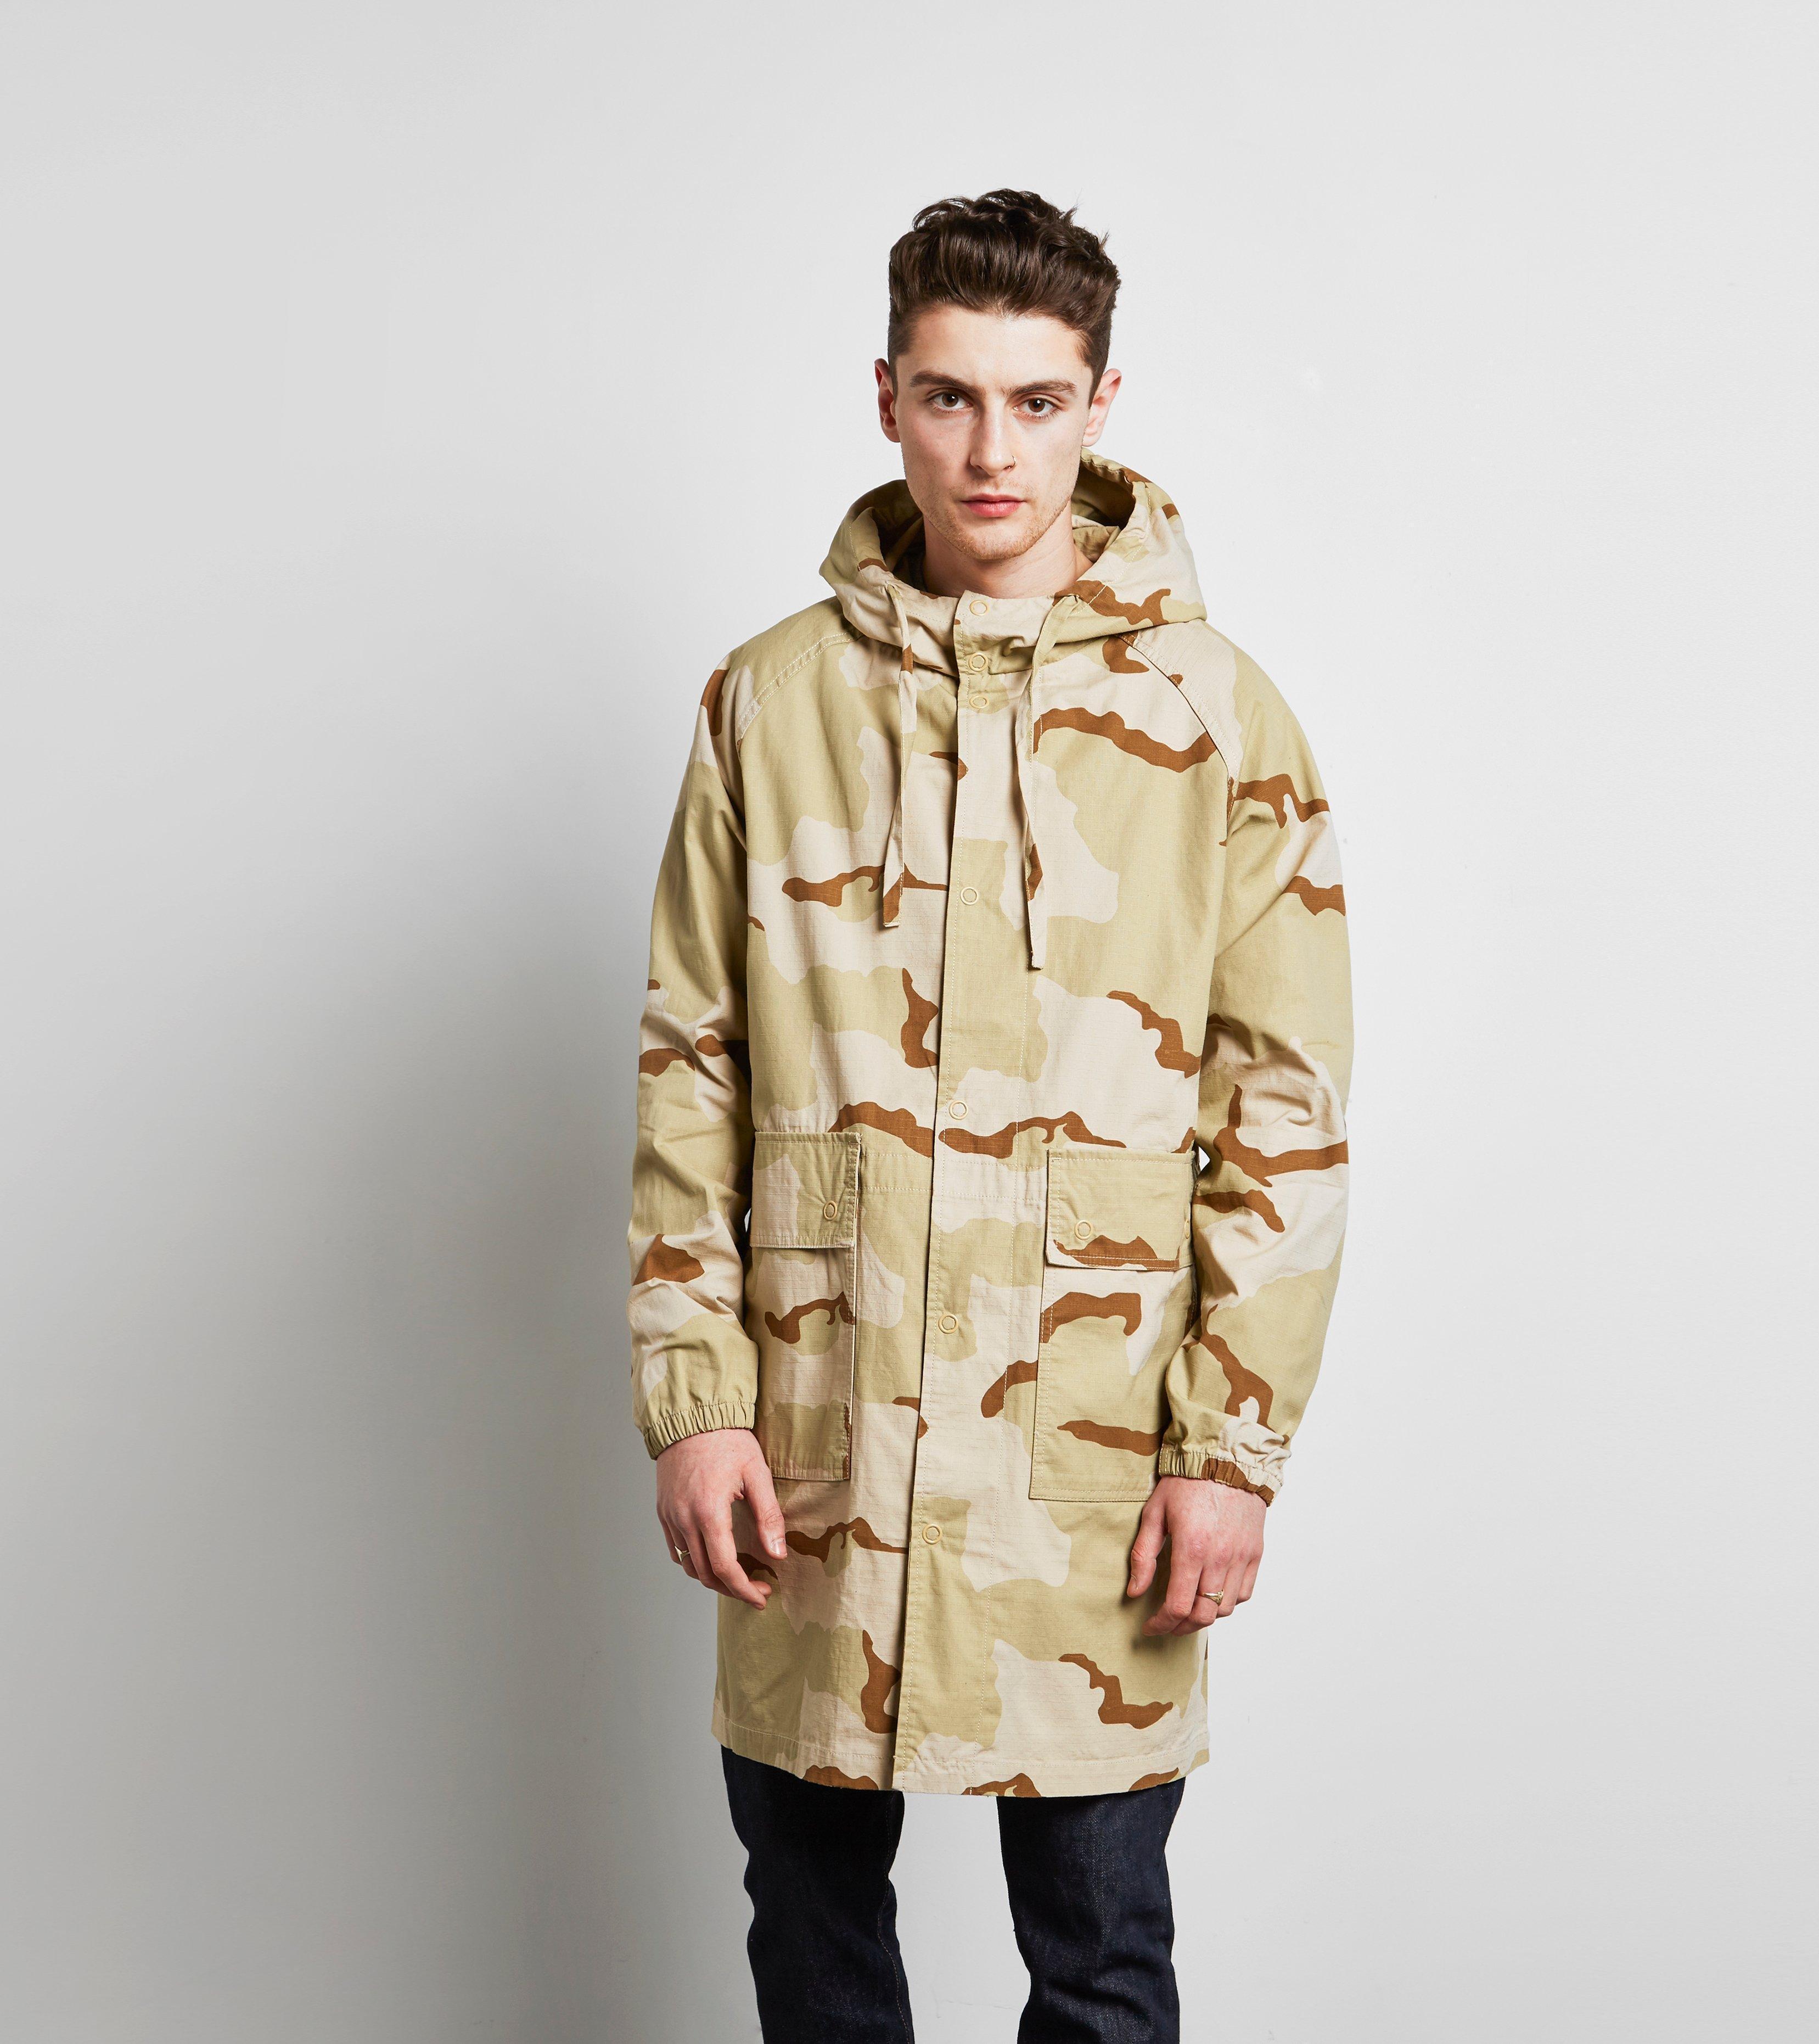 bce379c519d3 Stussy Long Ripstop Camo Jacket for Men - Lyst